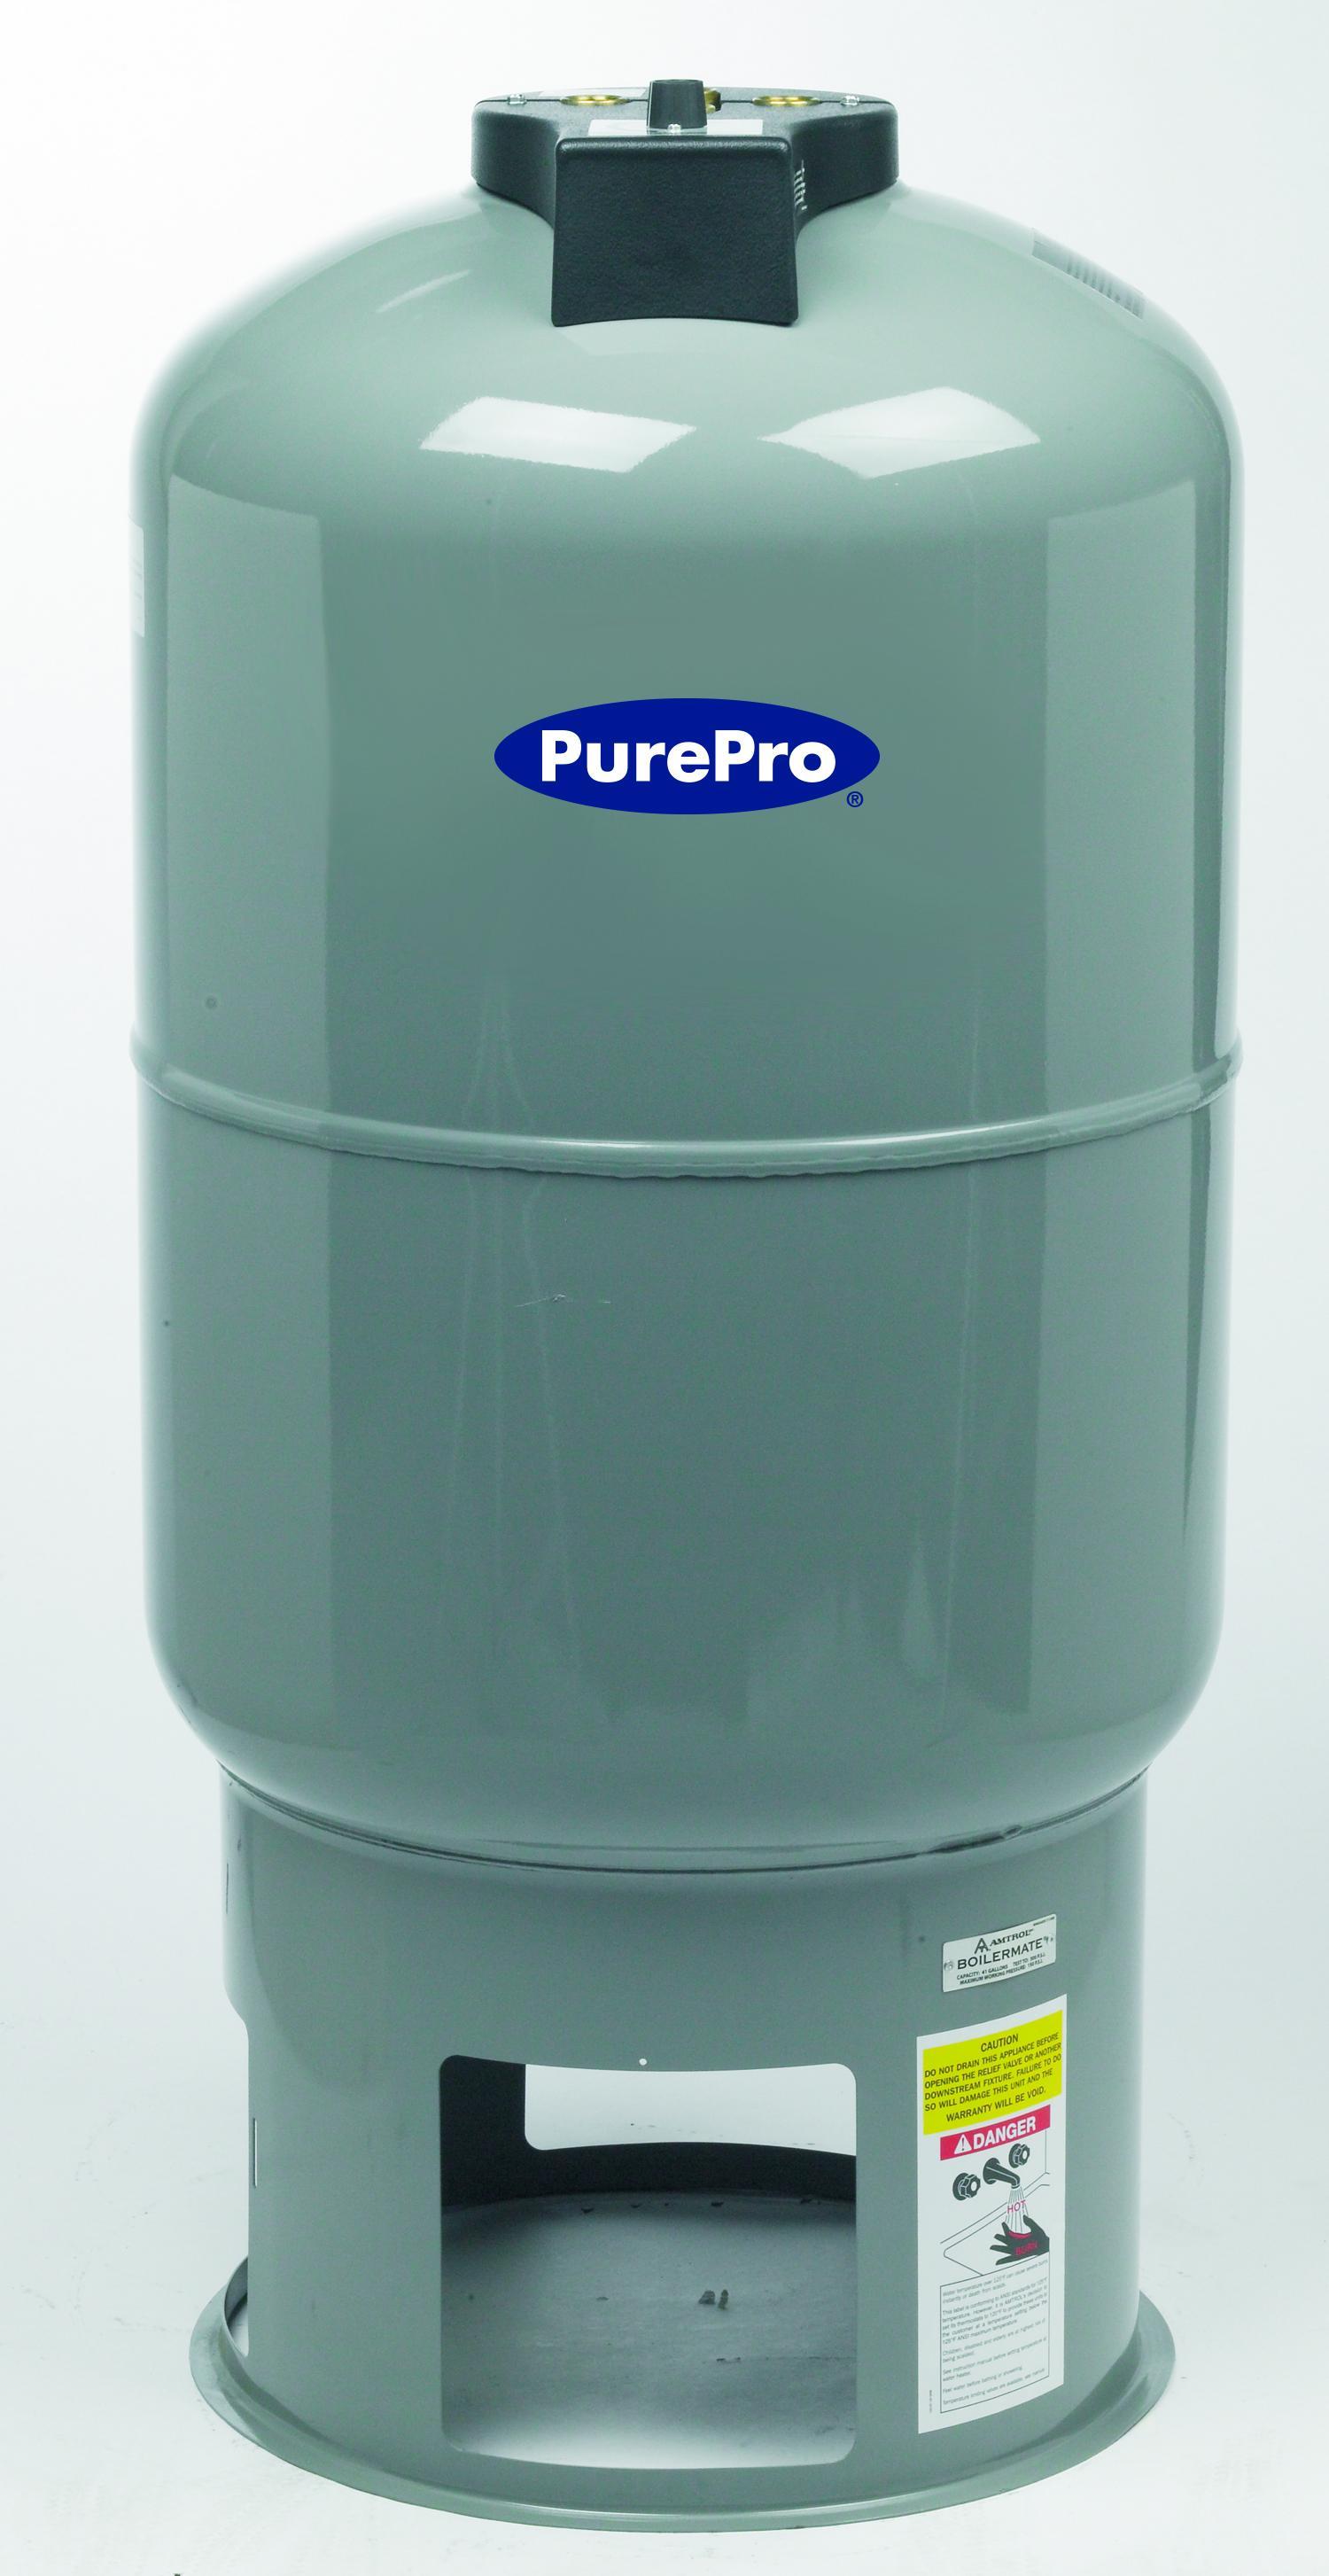 PurePro Hot Water Heater